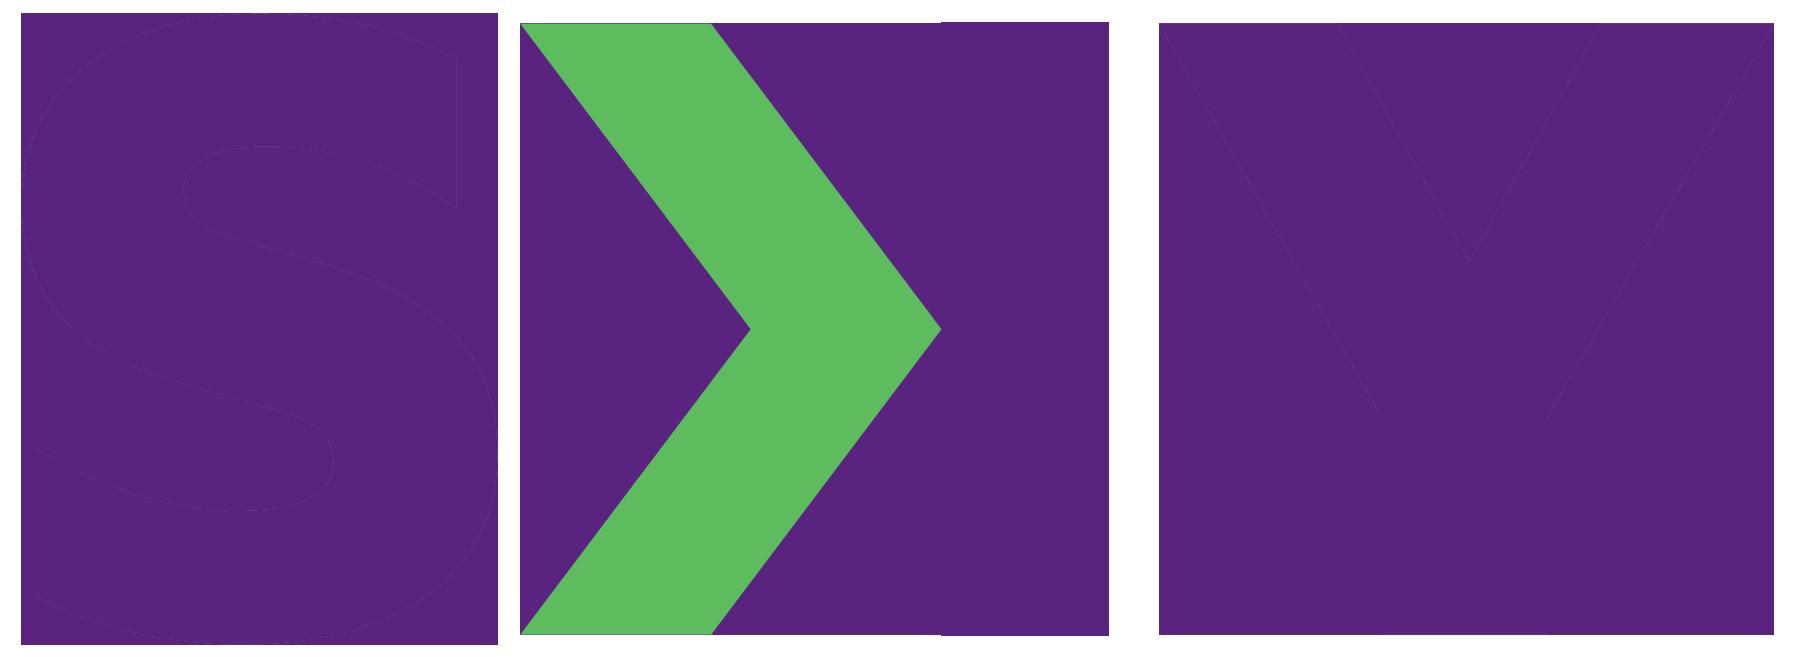 Resultado de imagen para sky airlines logo